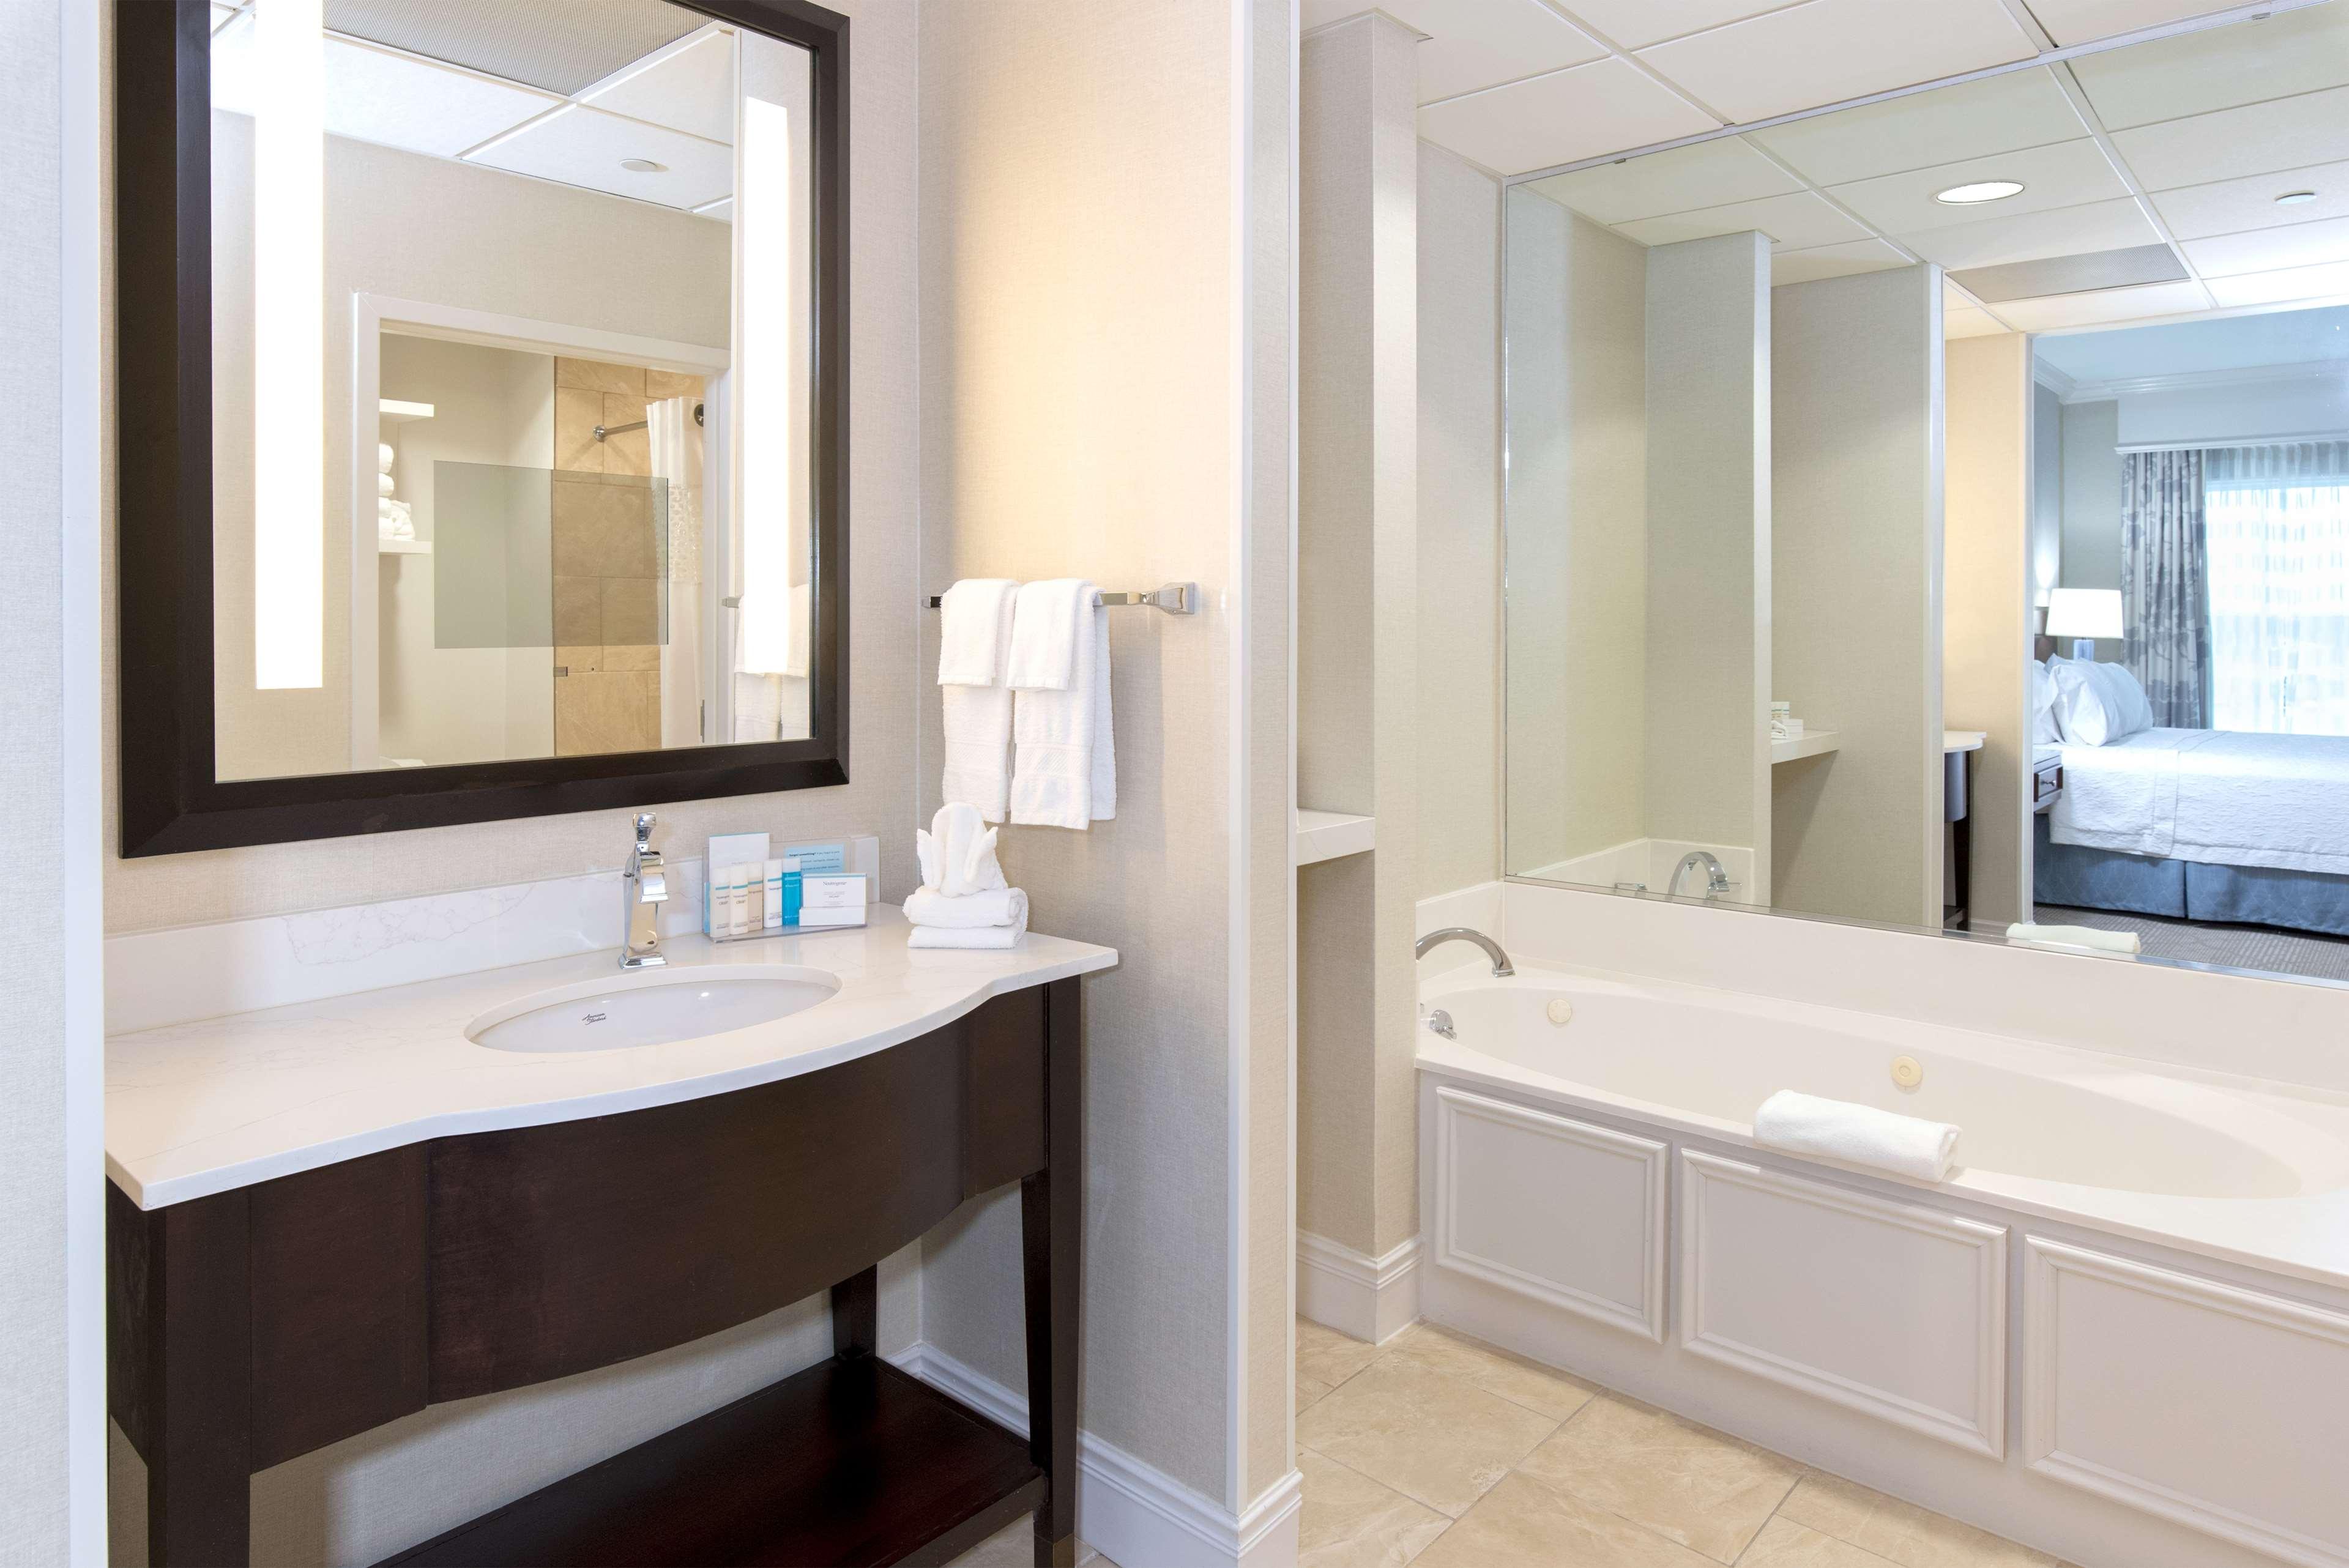 Hampton Inn & Suites Charlotte/South Park at Phillips Place image 40